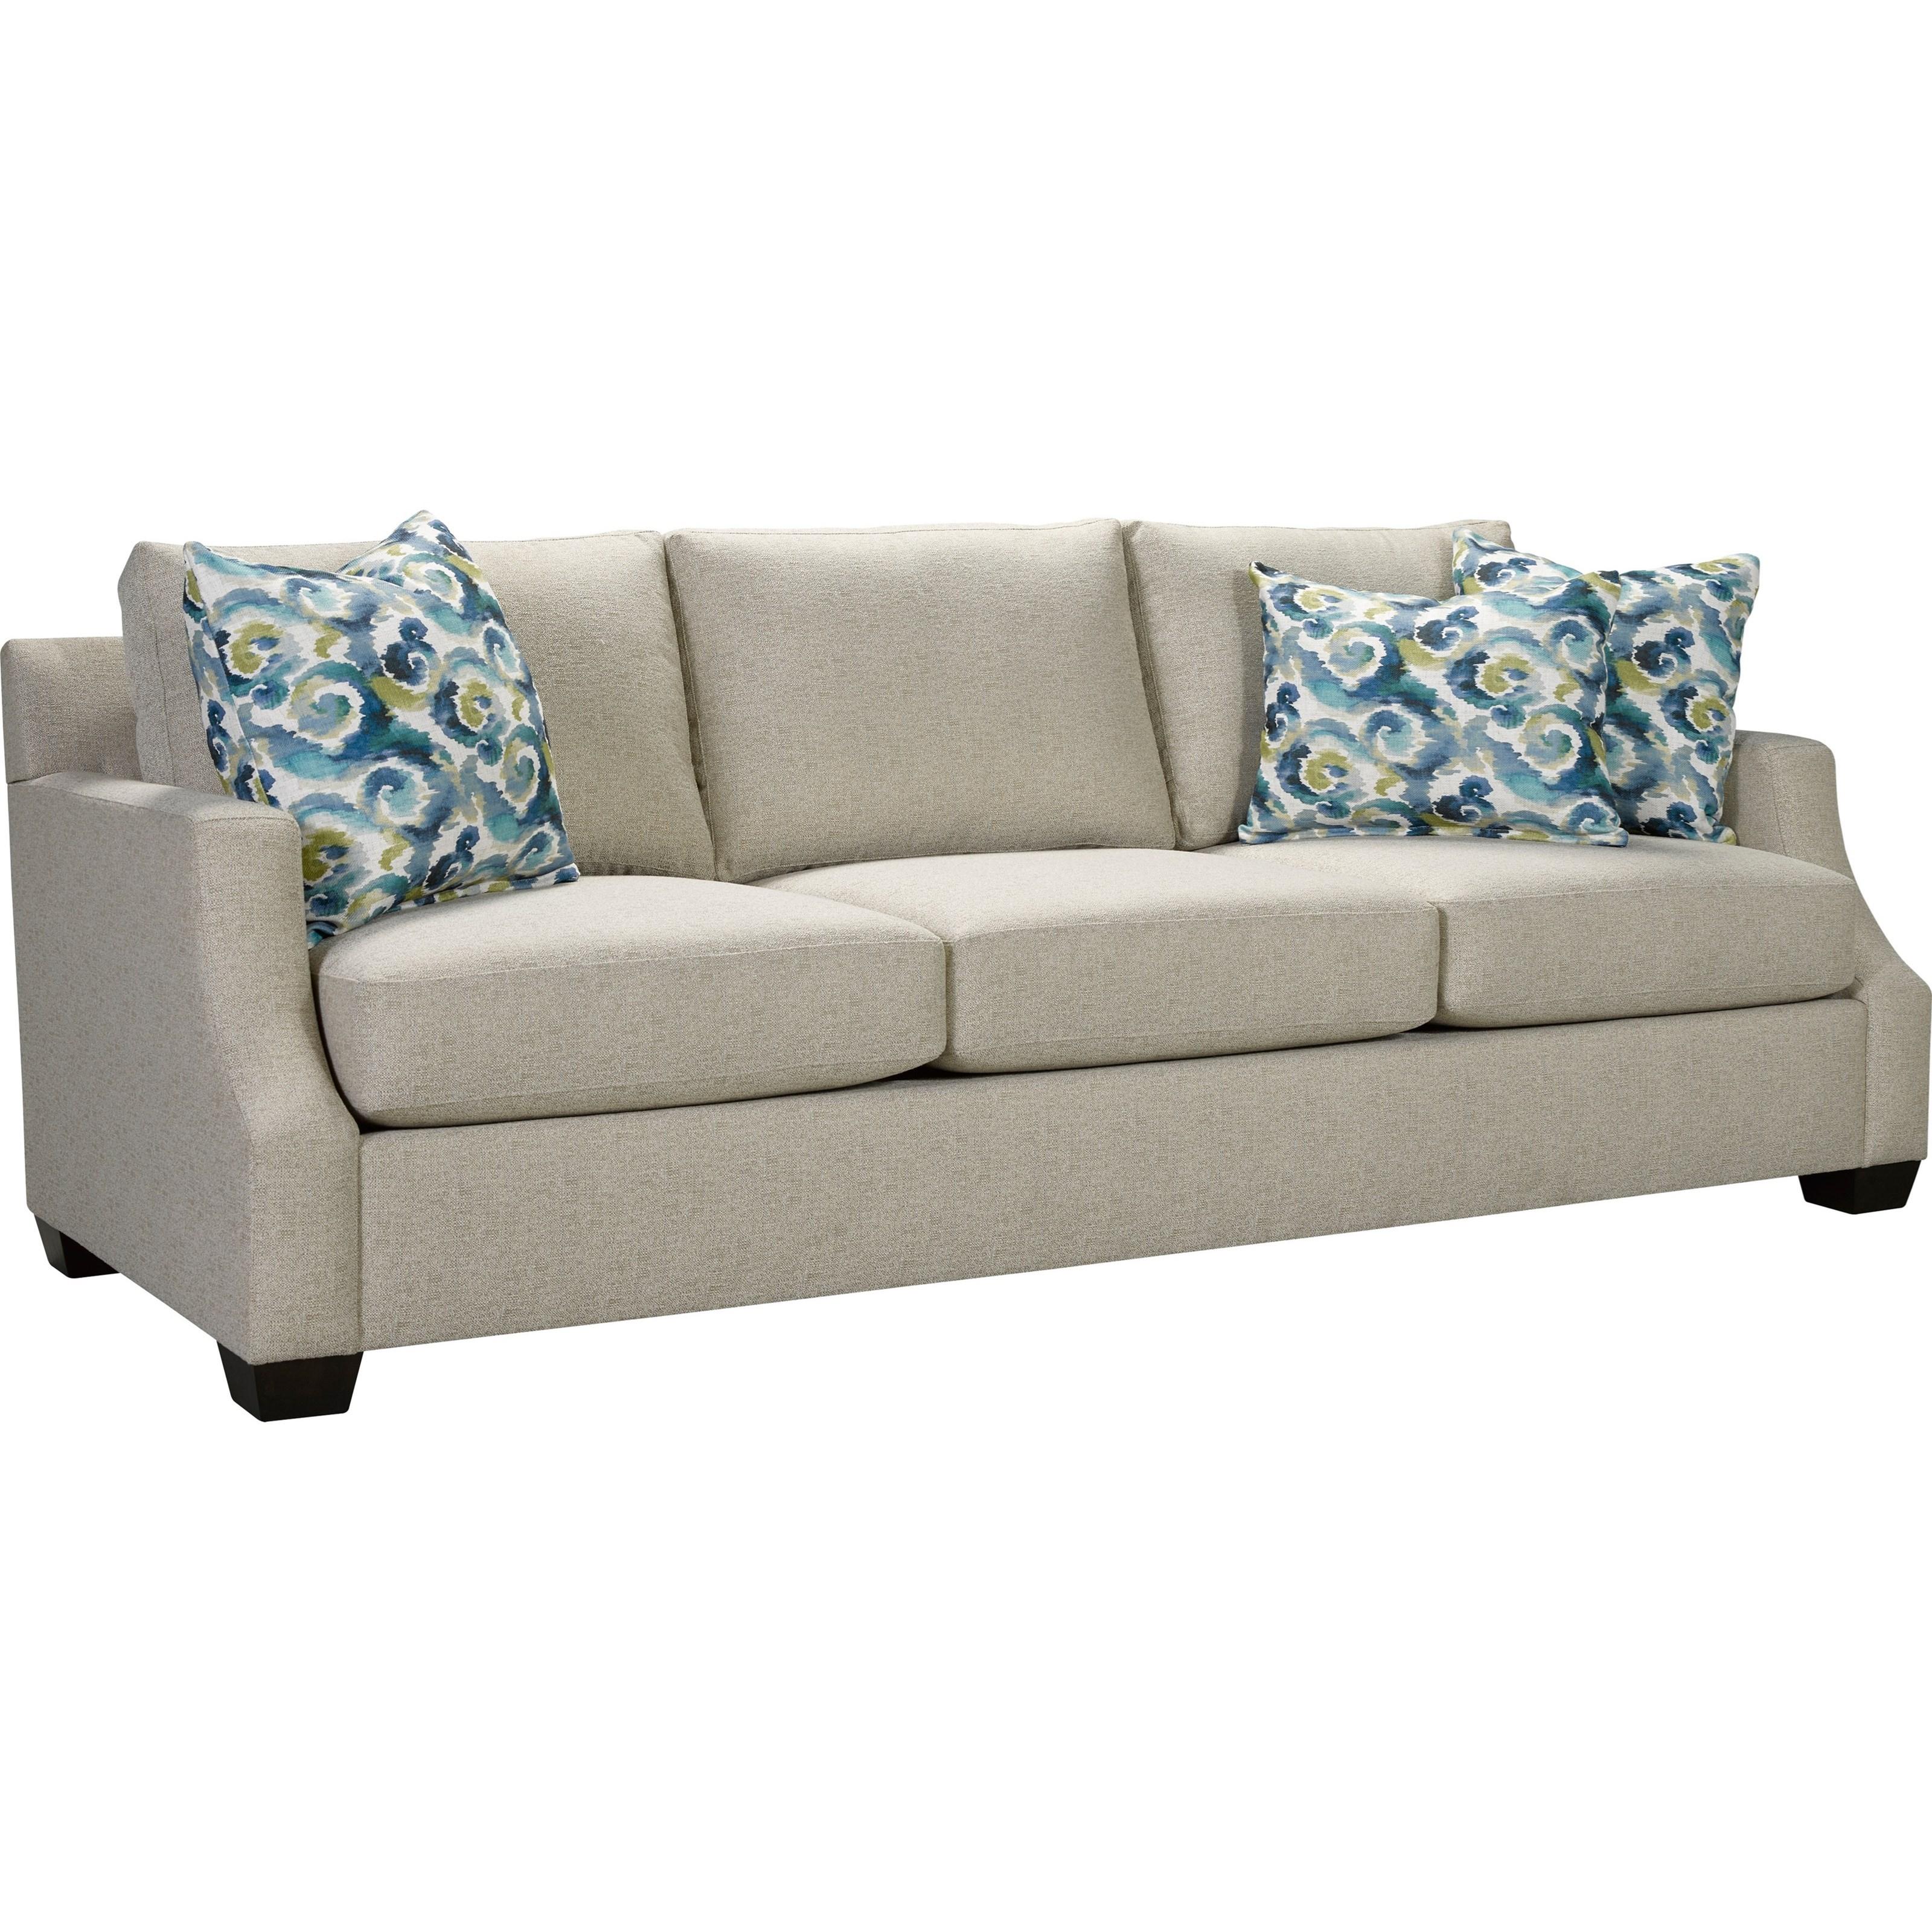 High Quality Broyhill Furniture ChambersSofa; Broyhill Furniture ChambersSofa